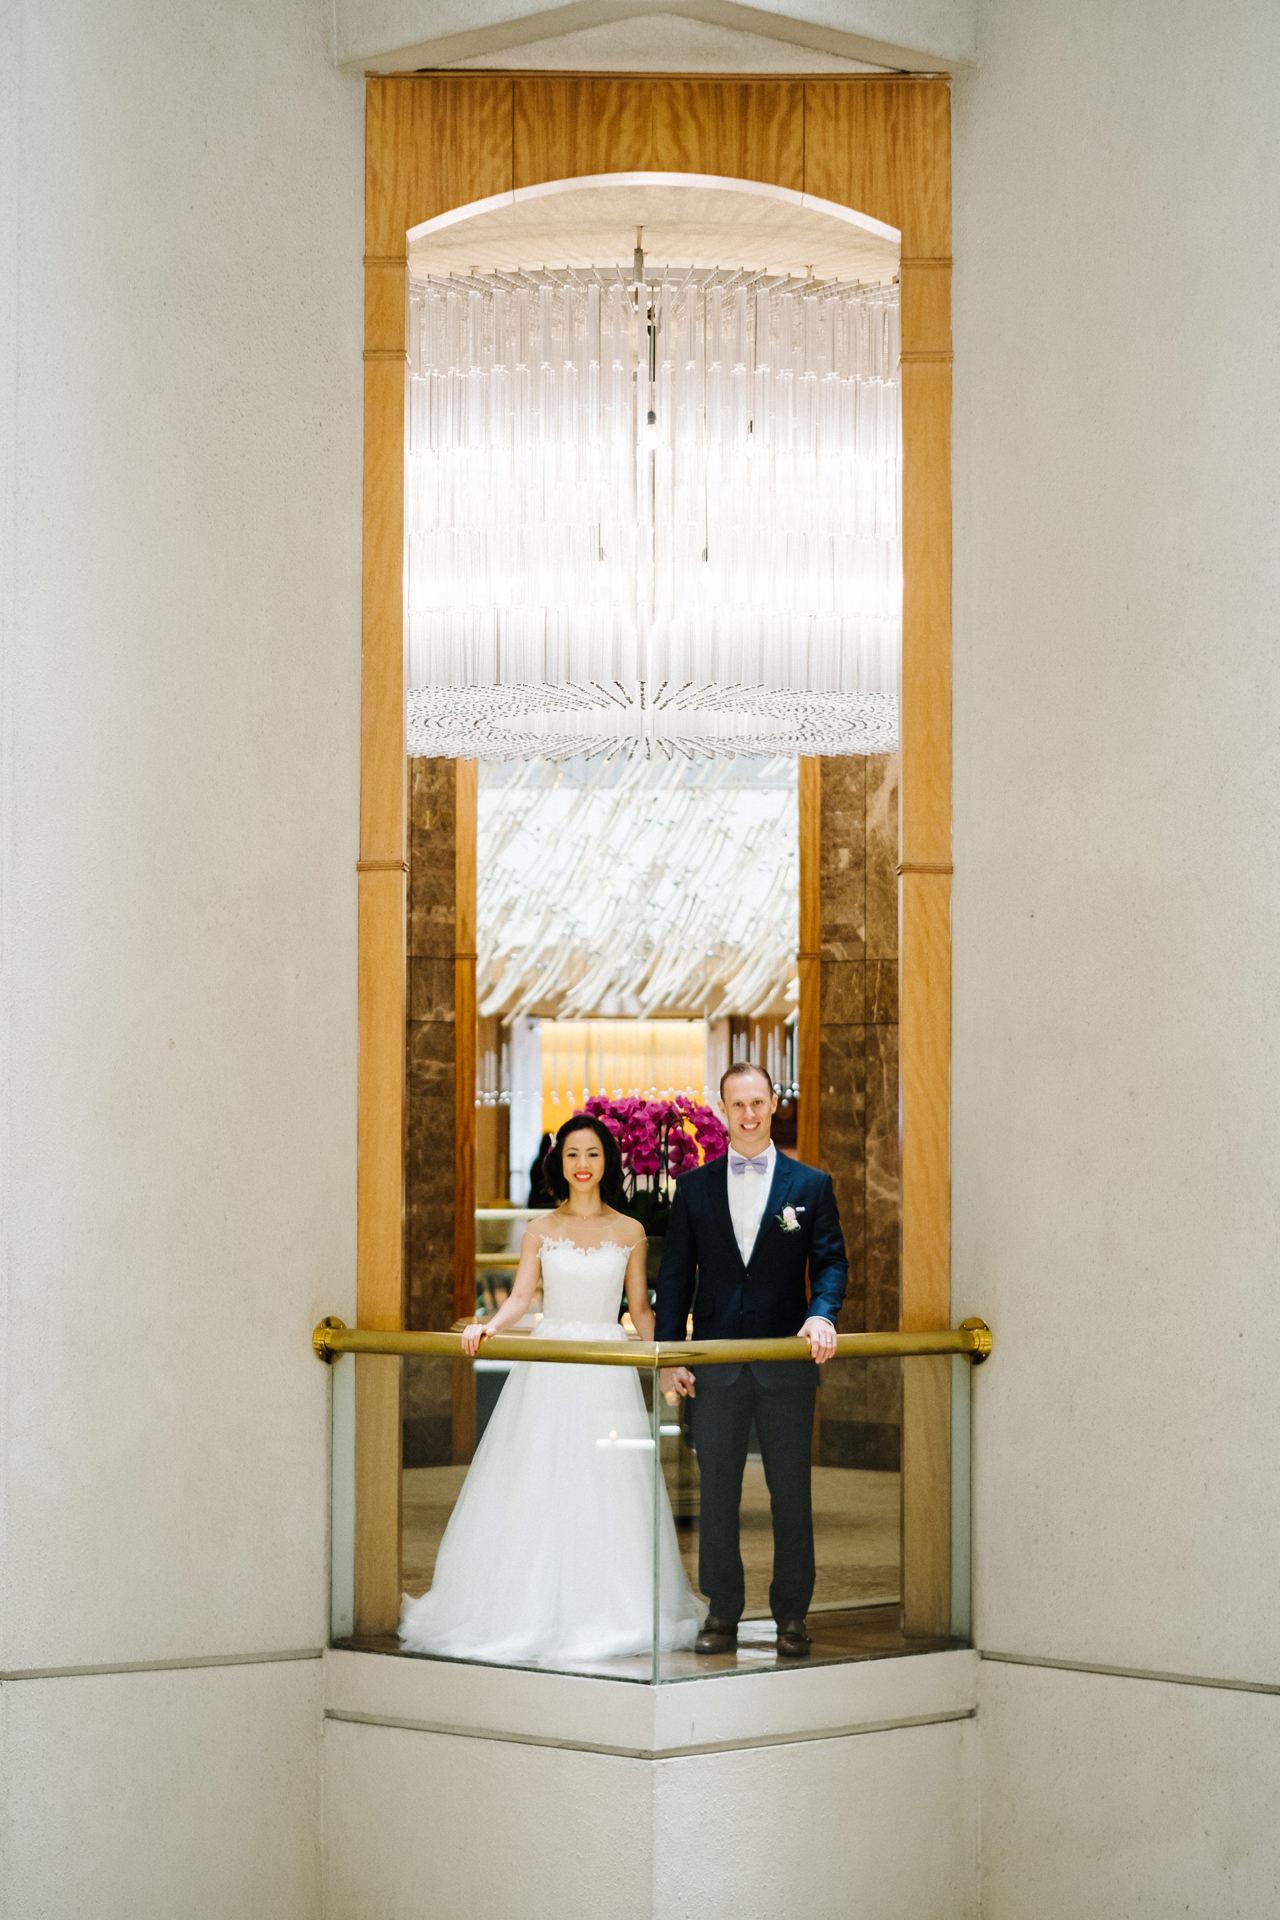 K&M: From Bali to Singapore Wedding Destination 8